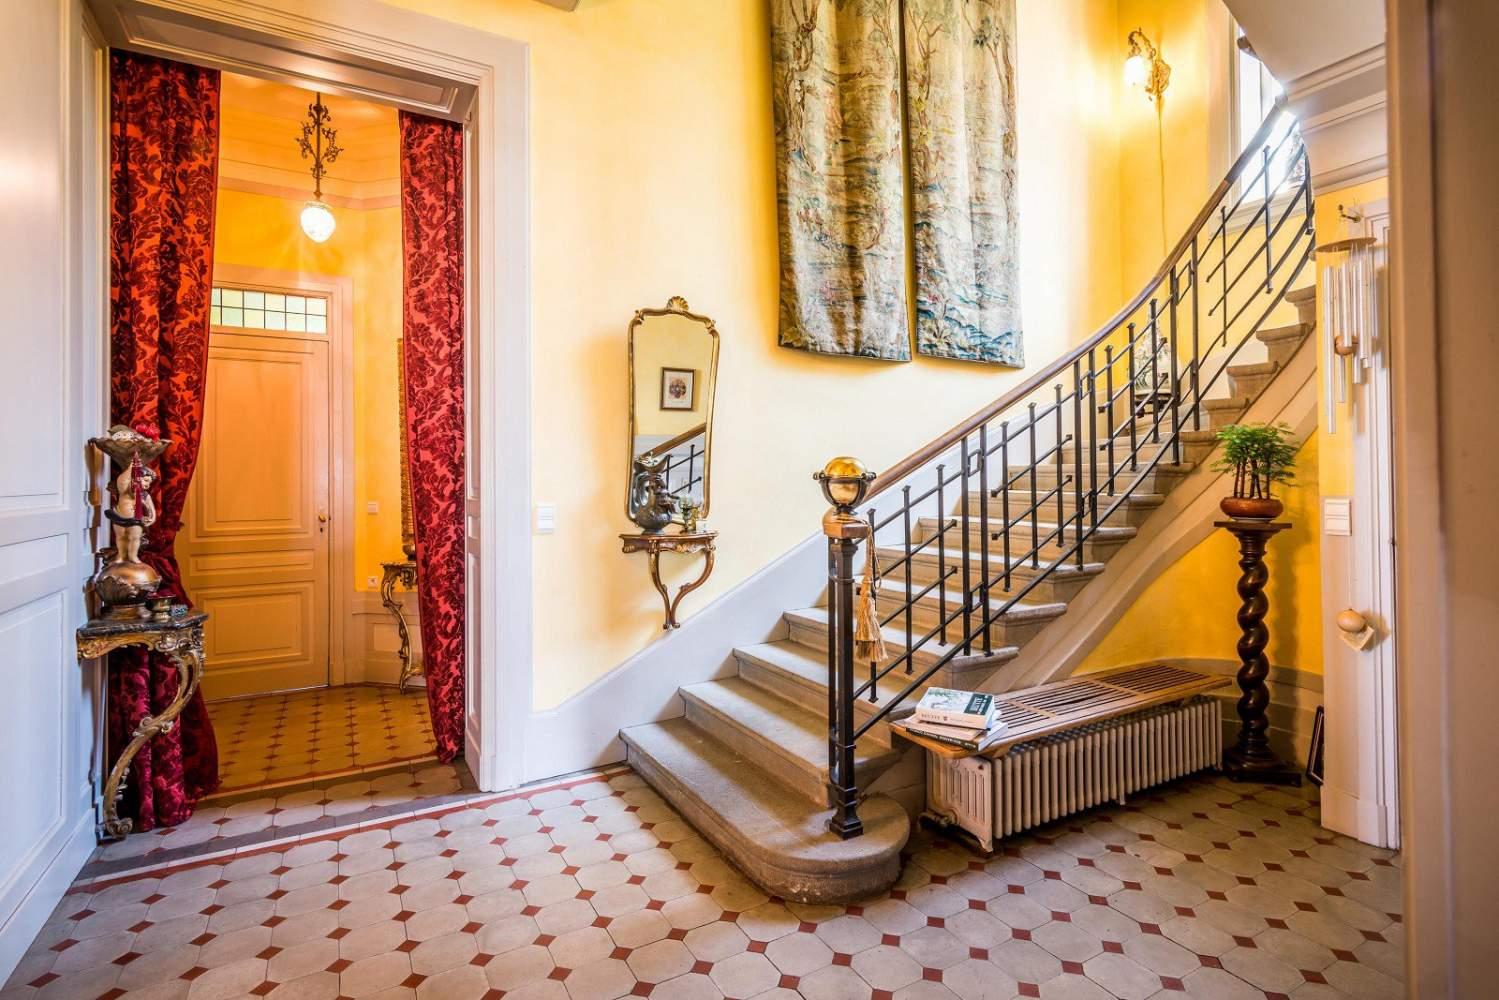 Thonon-les-Bains  - Casa 16 Cuartos 10 Habitaciones - picture 5